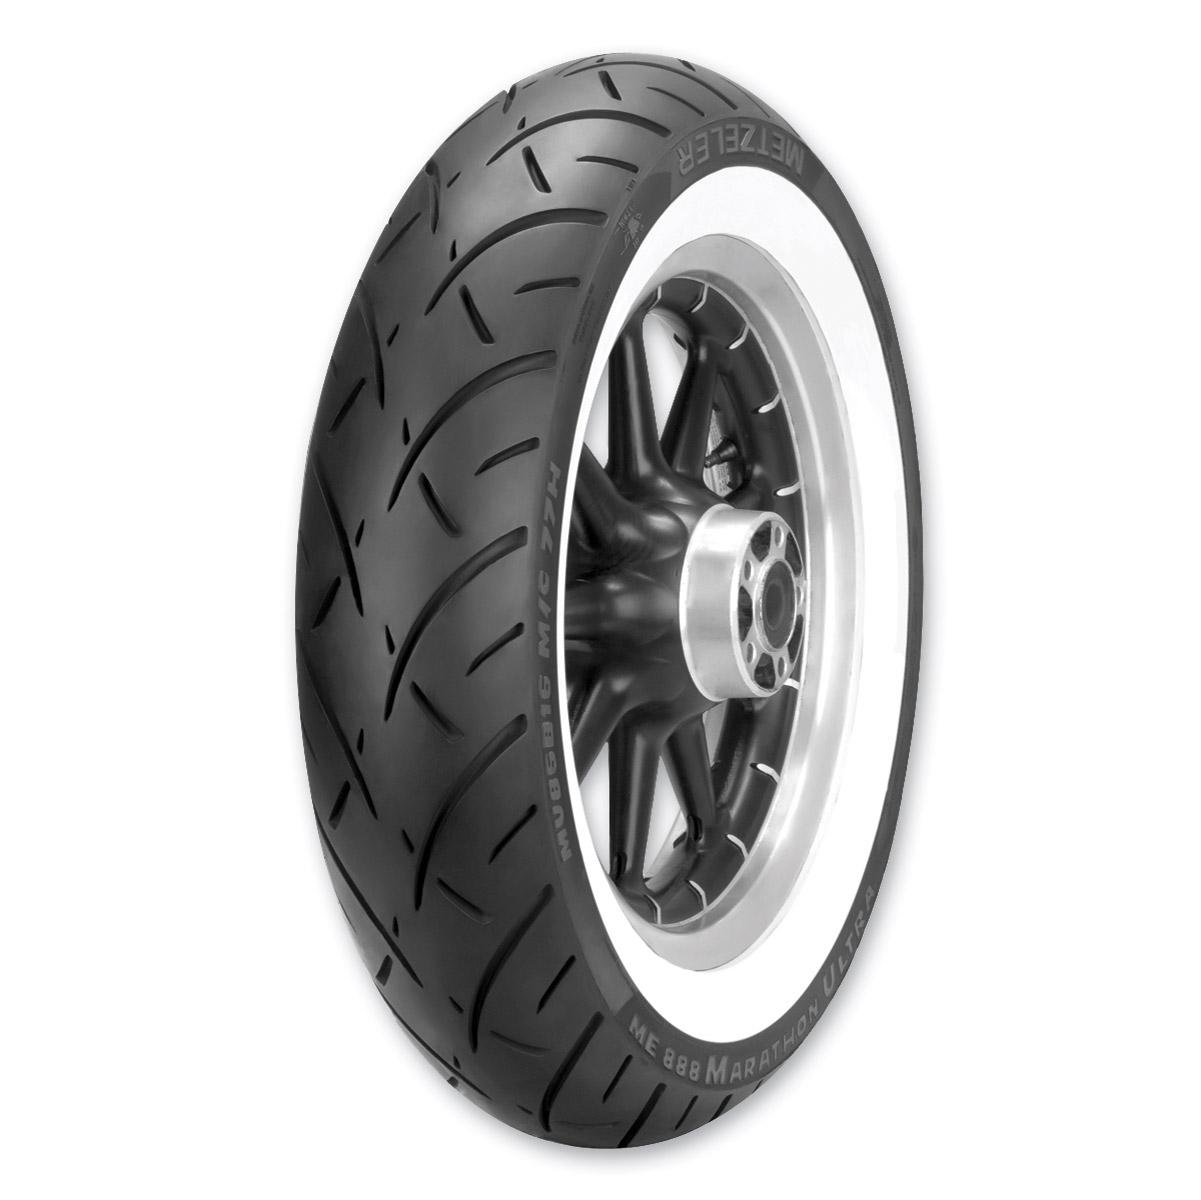 Metzeler ME888 Marathon Ultra 140/90B16 Wide Whitewall Rear Tire